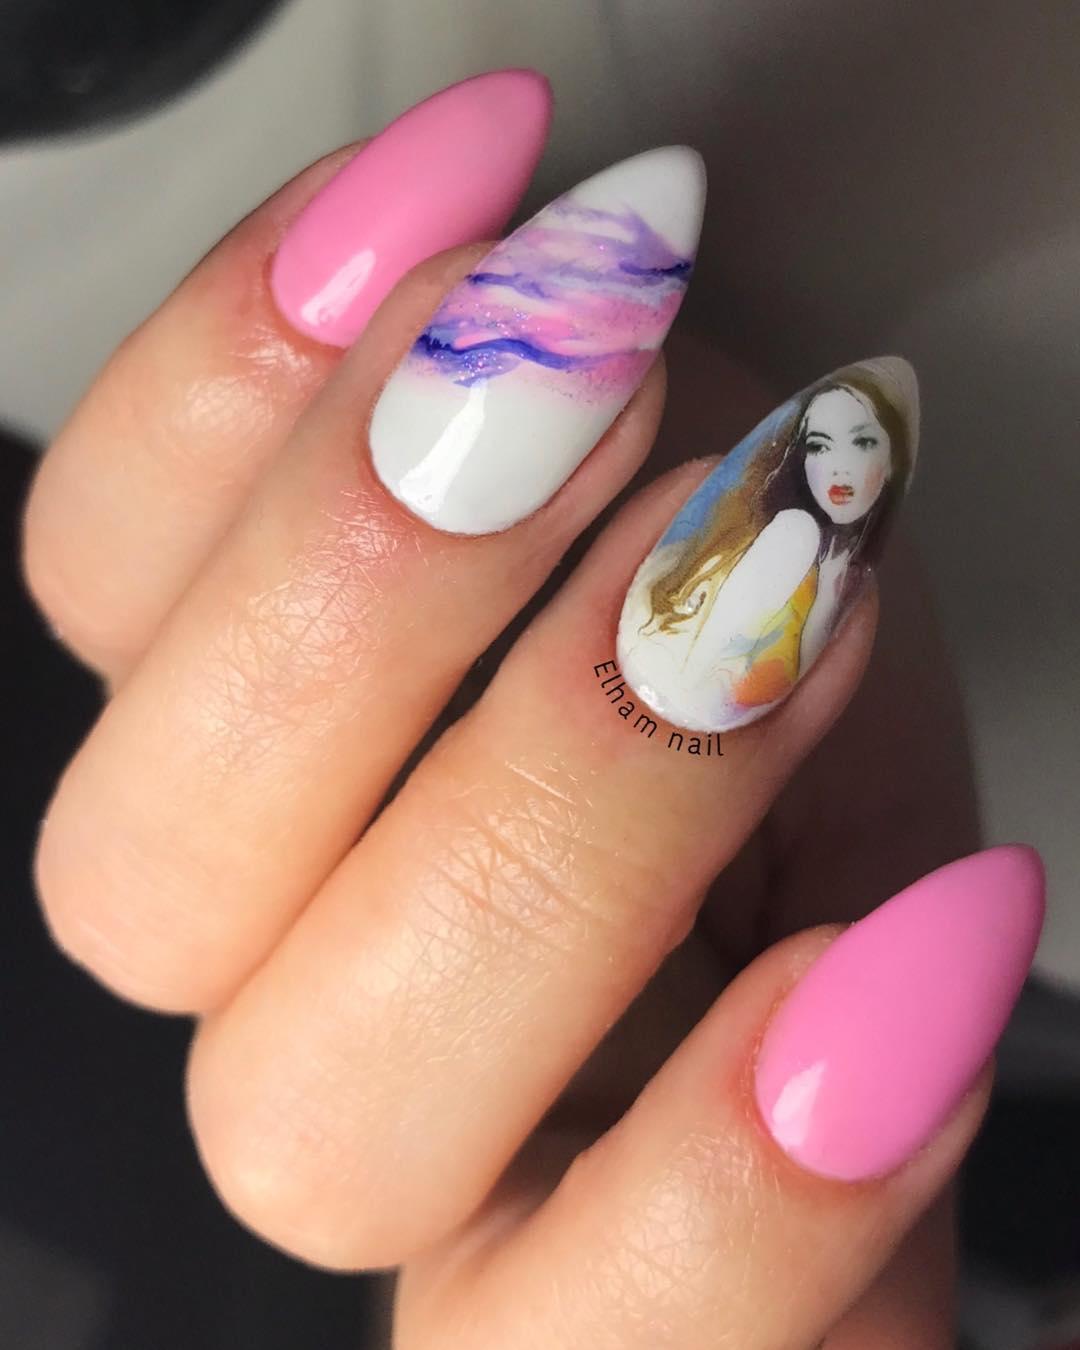 cool pink nail designs 2019 13 - 21 Cool Pink Nail Designs 2019